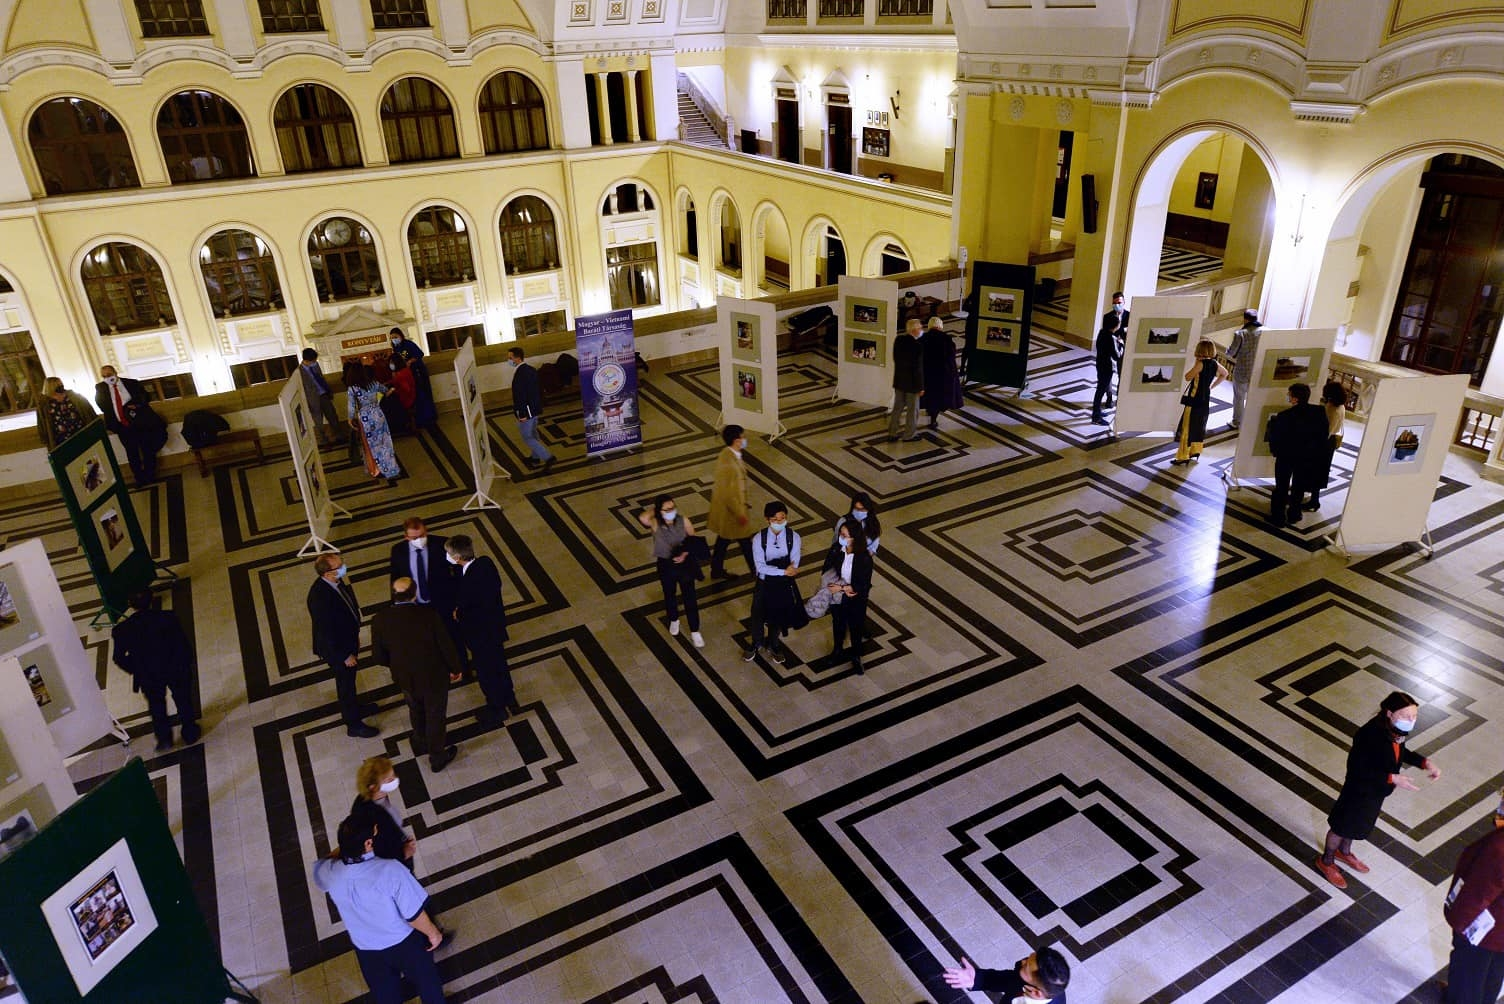 Diverse activities mark vietnam hungary diplomatic ties despite covid-19